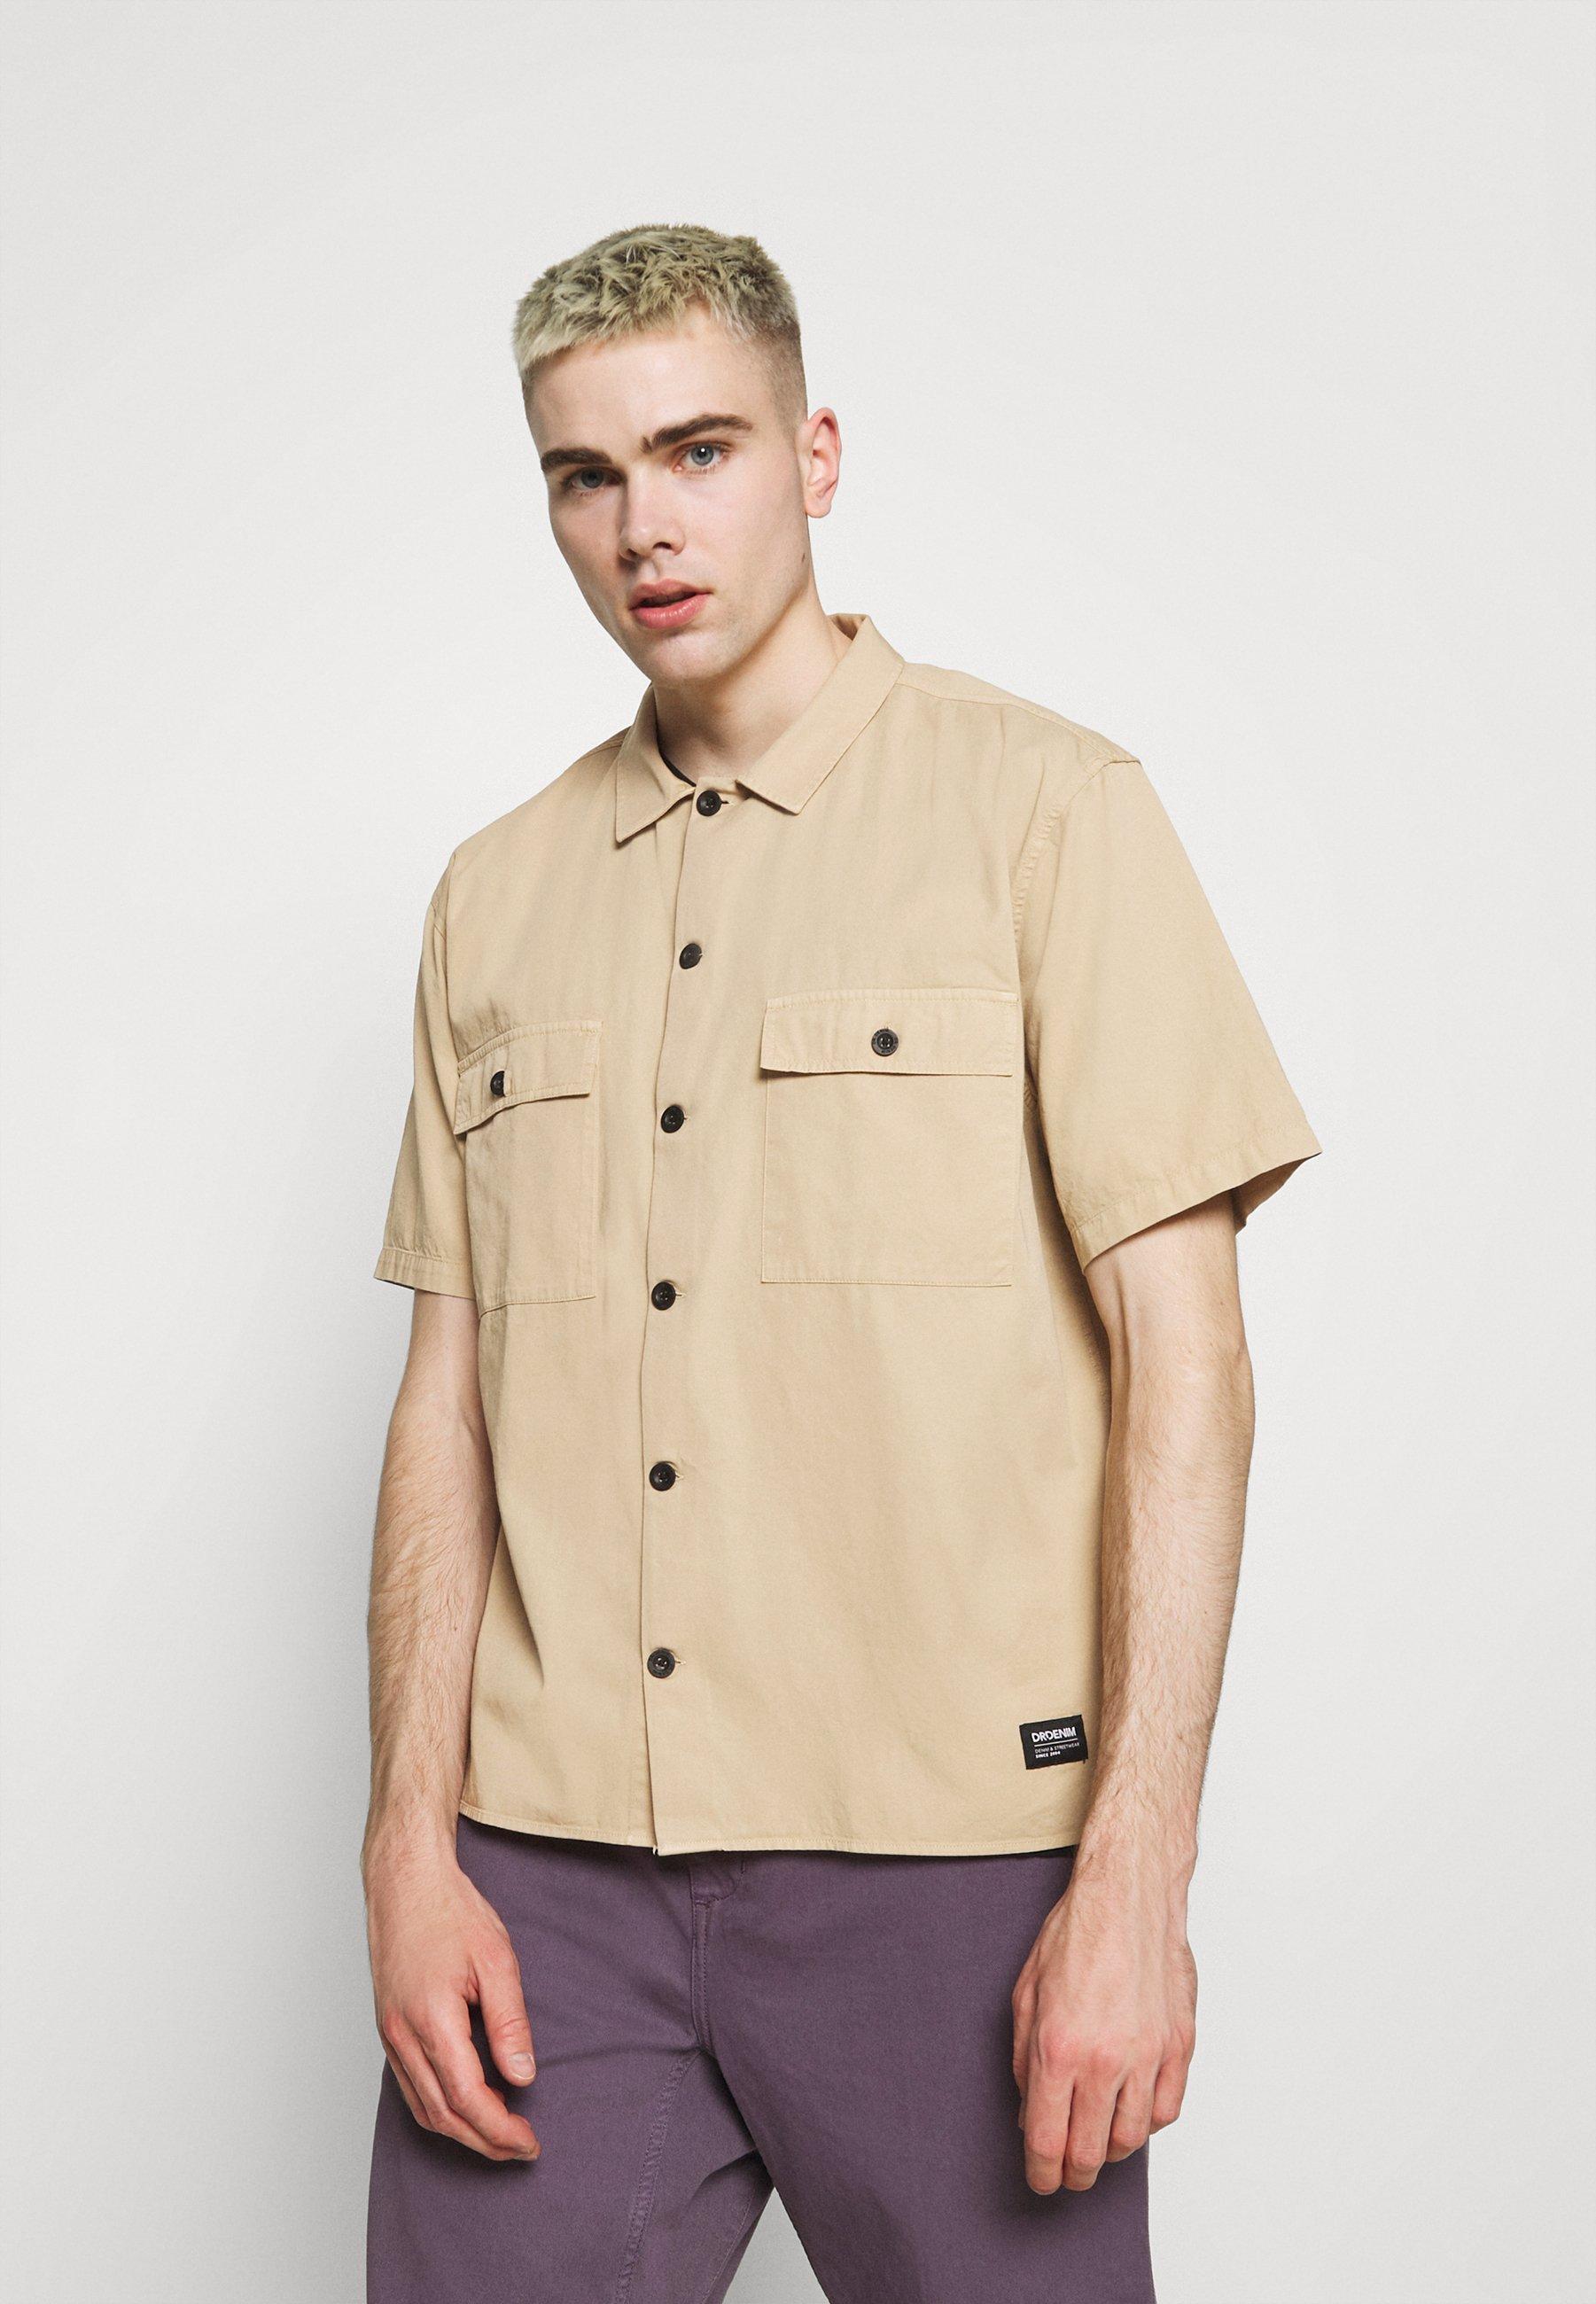 Uomo JOEL WORKER SHIRT - Camicia